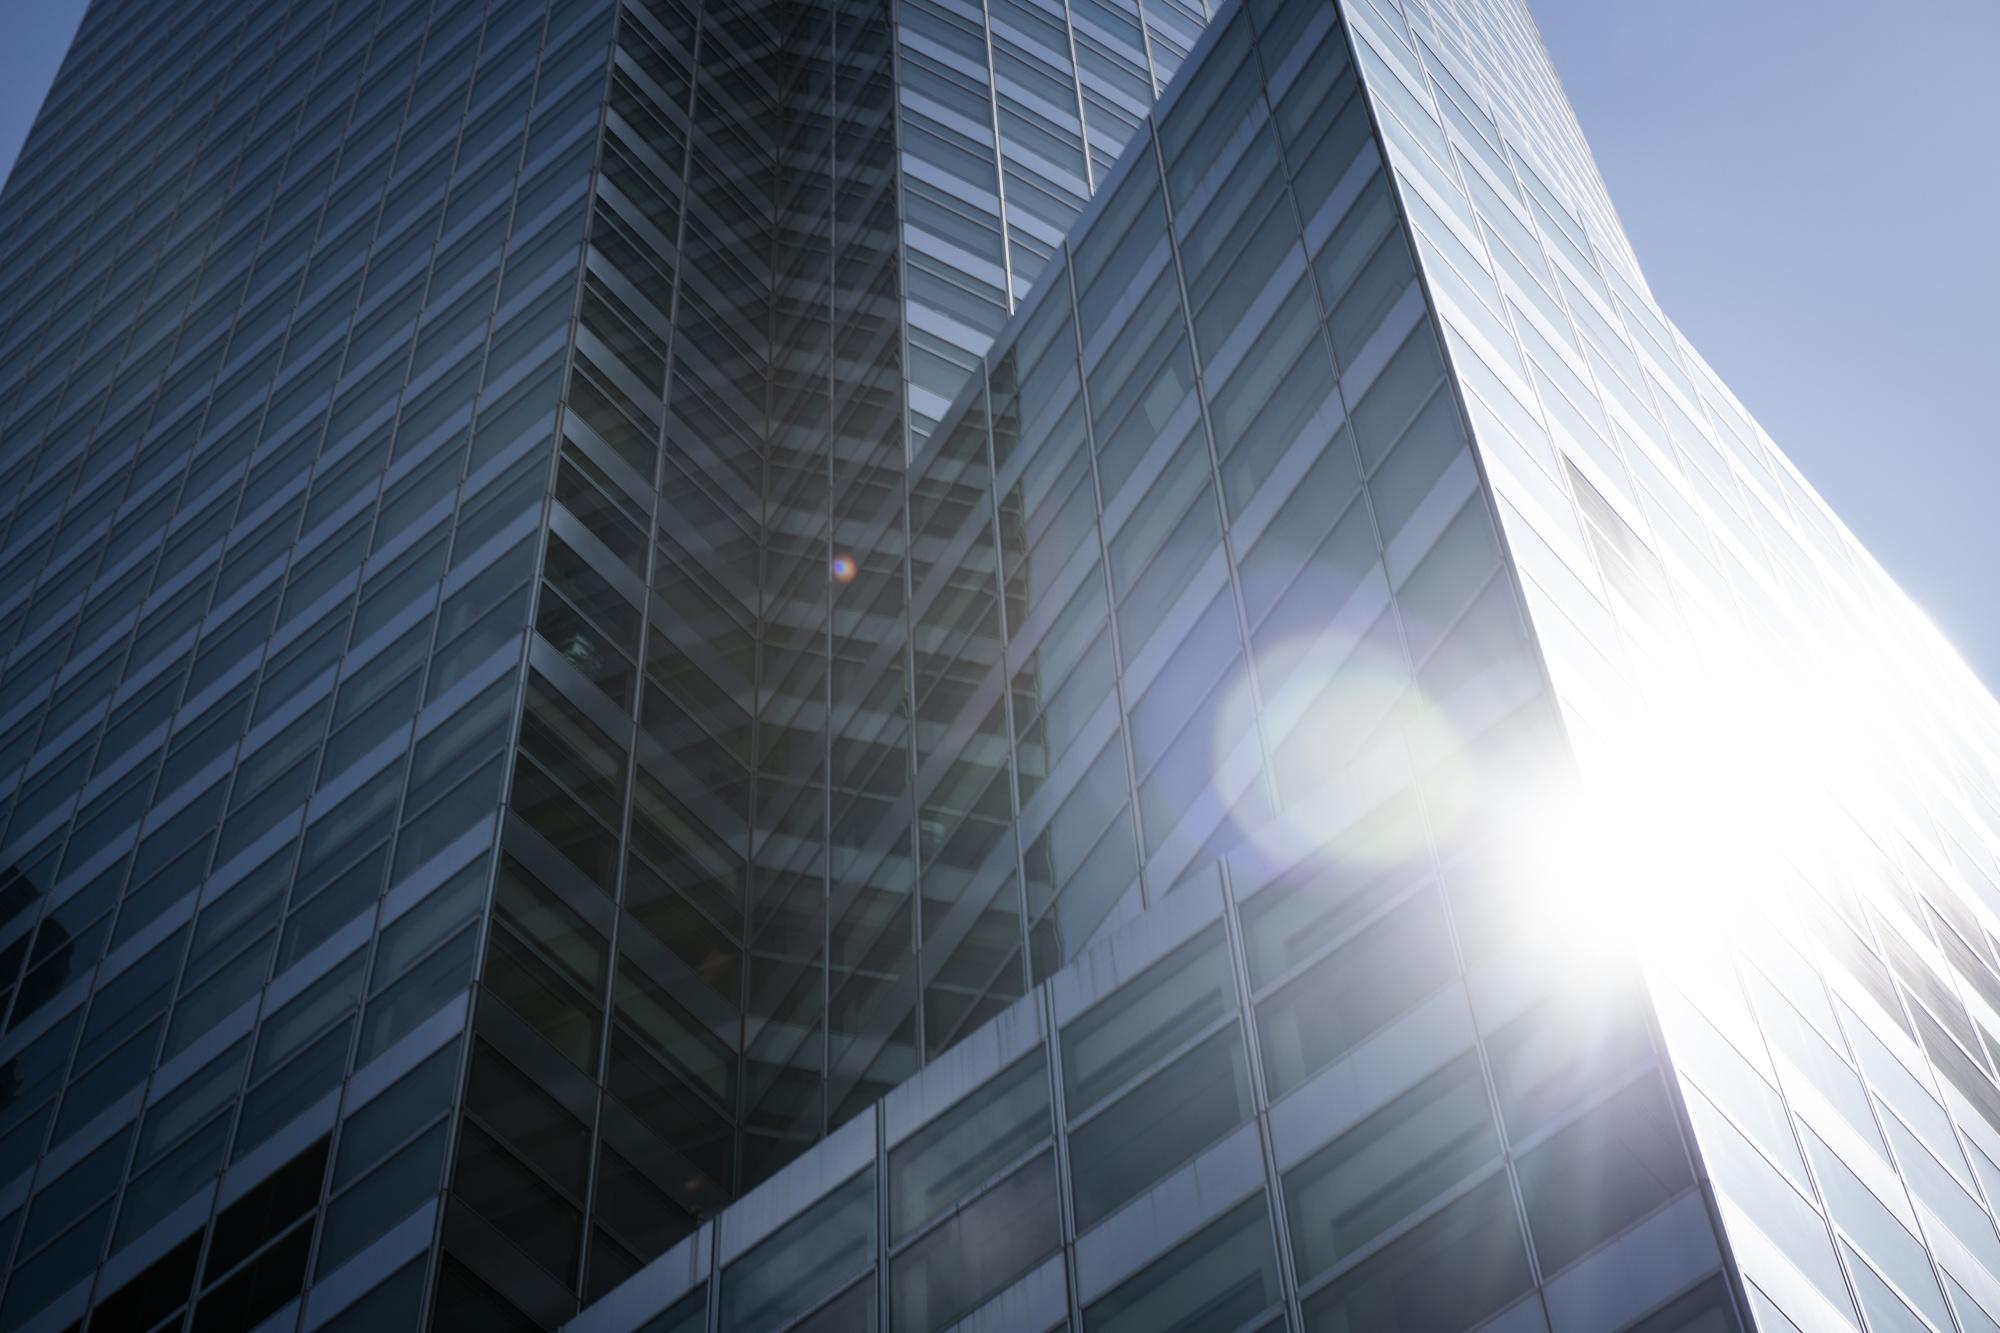 Goldman sachs investește în cripto